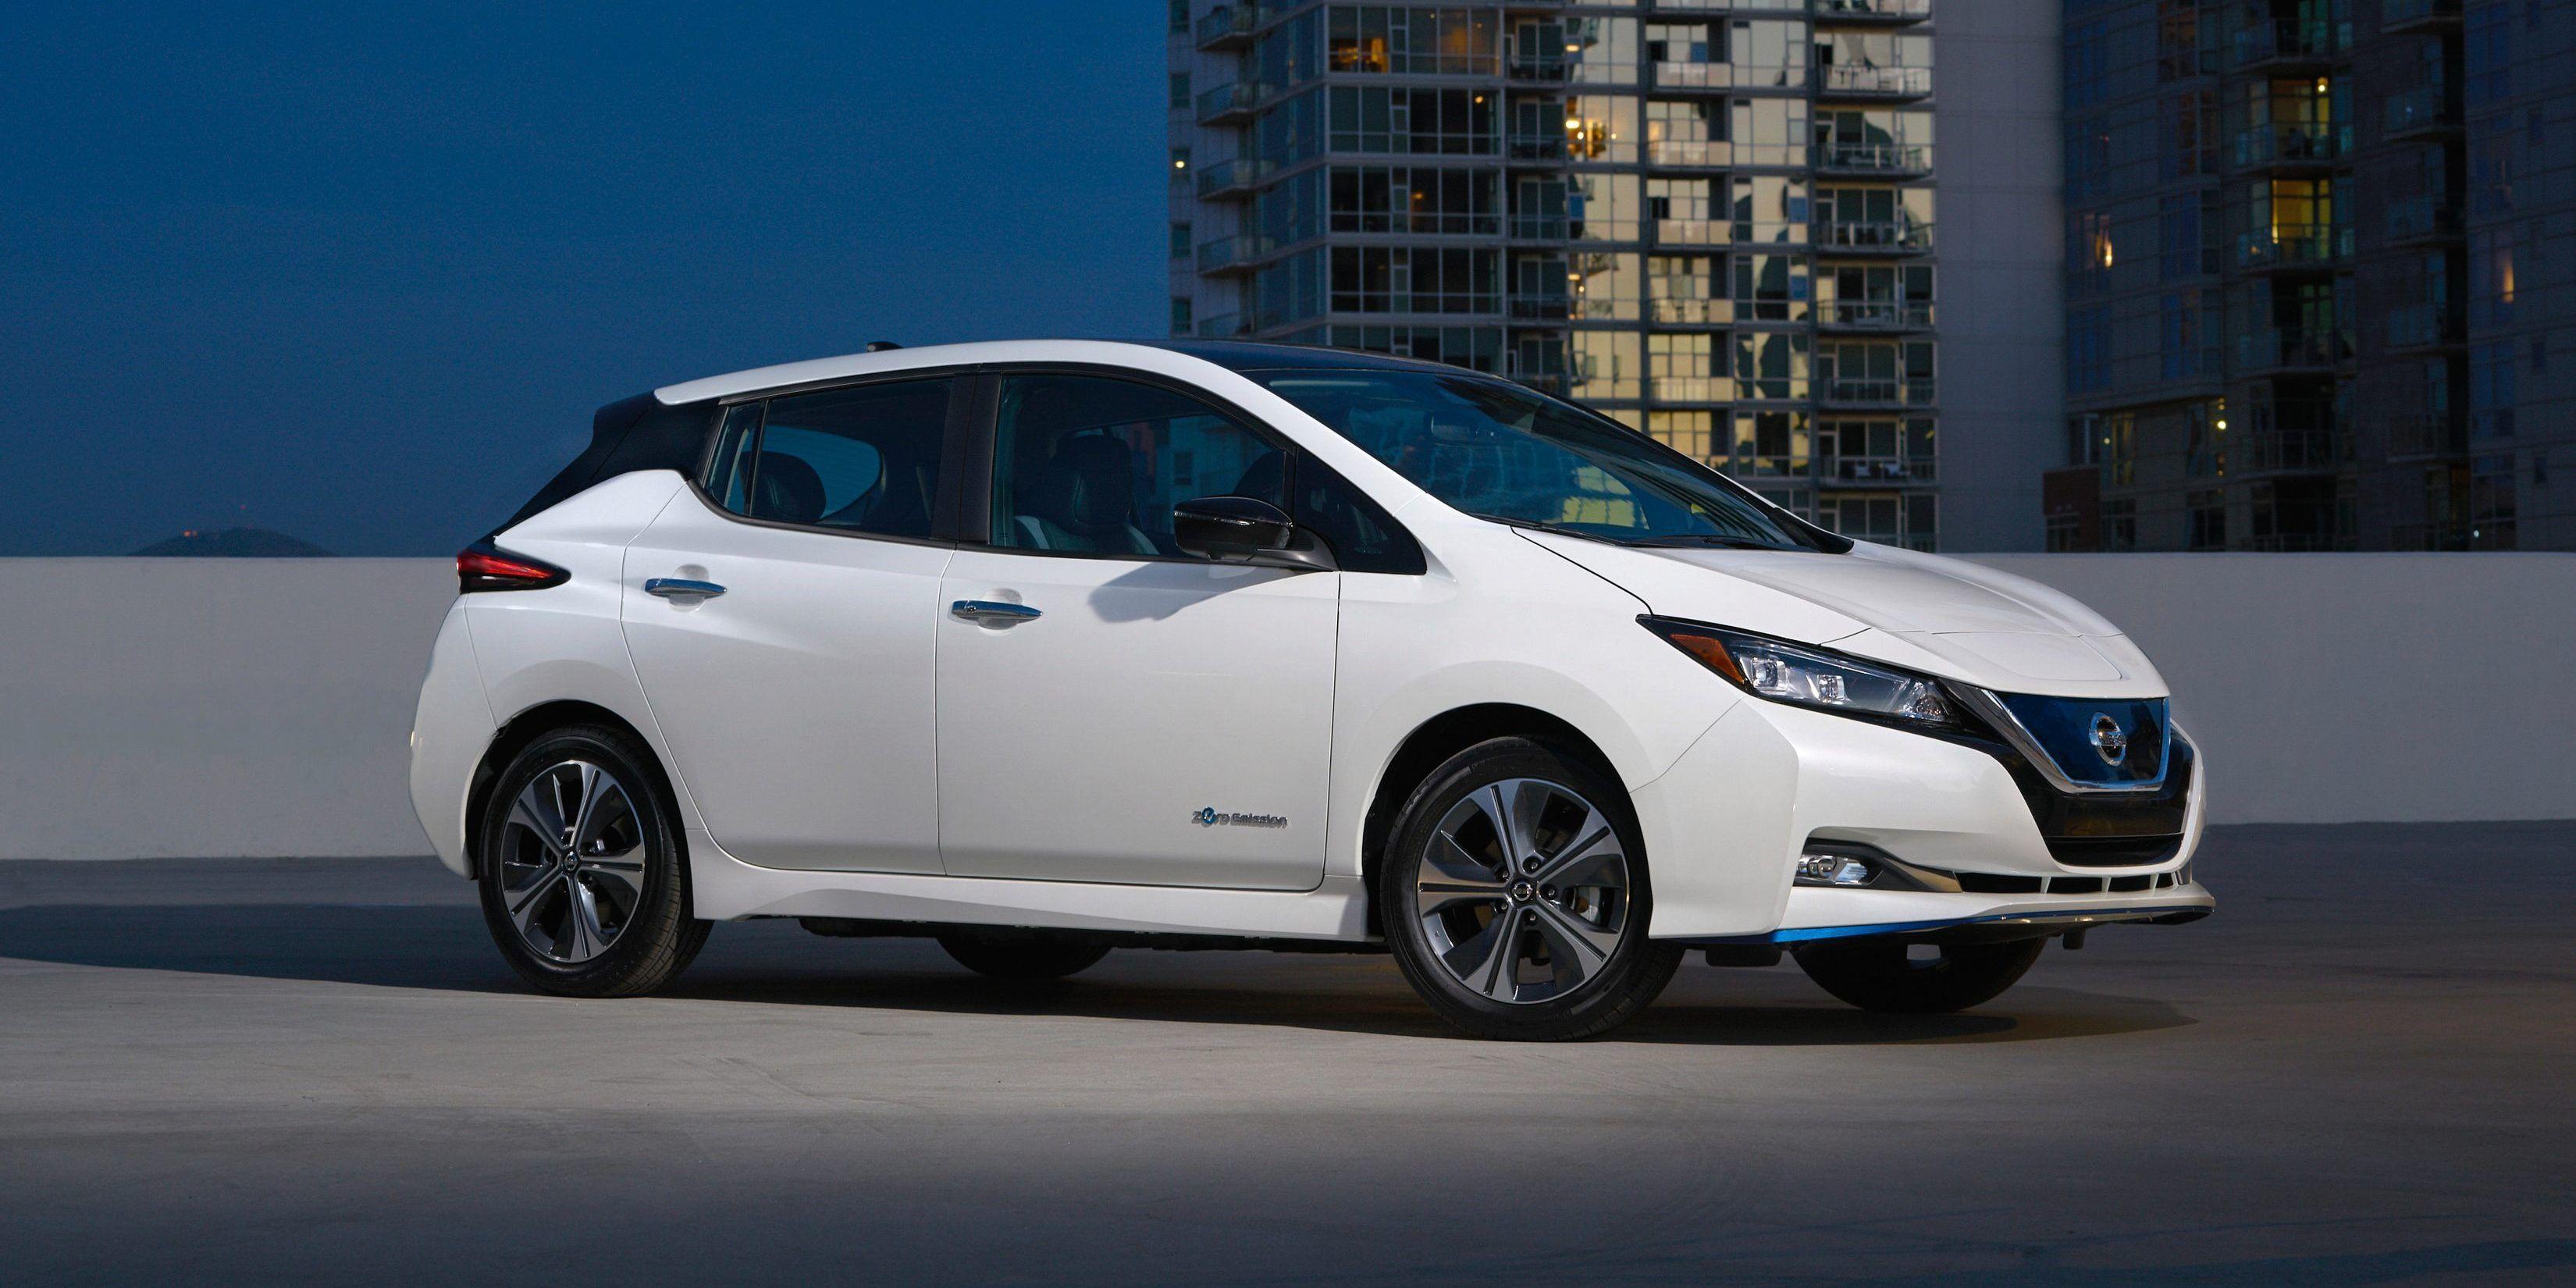 Idealmagnetsolutions On Nissan Leaf Nissan Electric Car Nissan